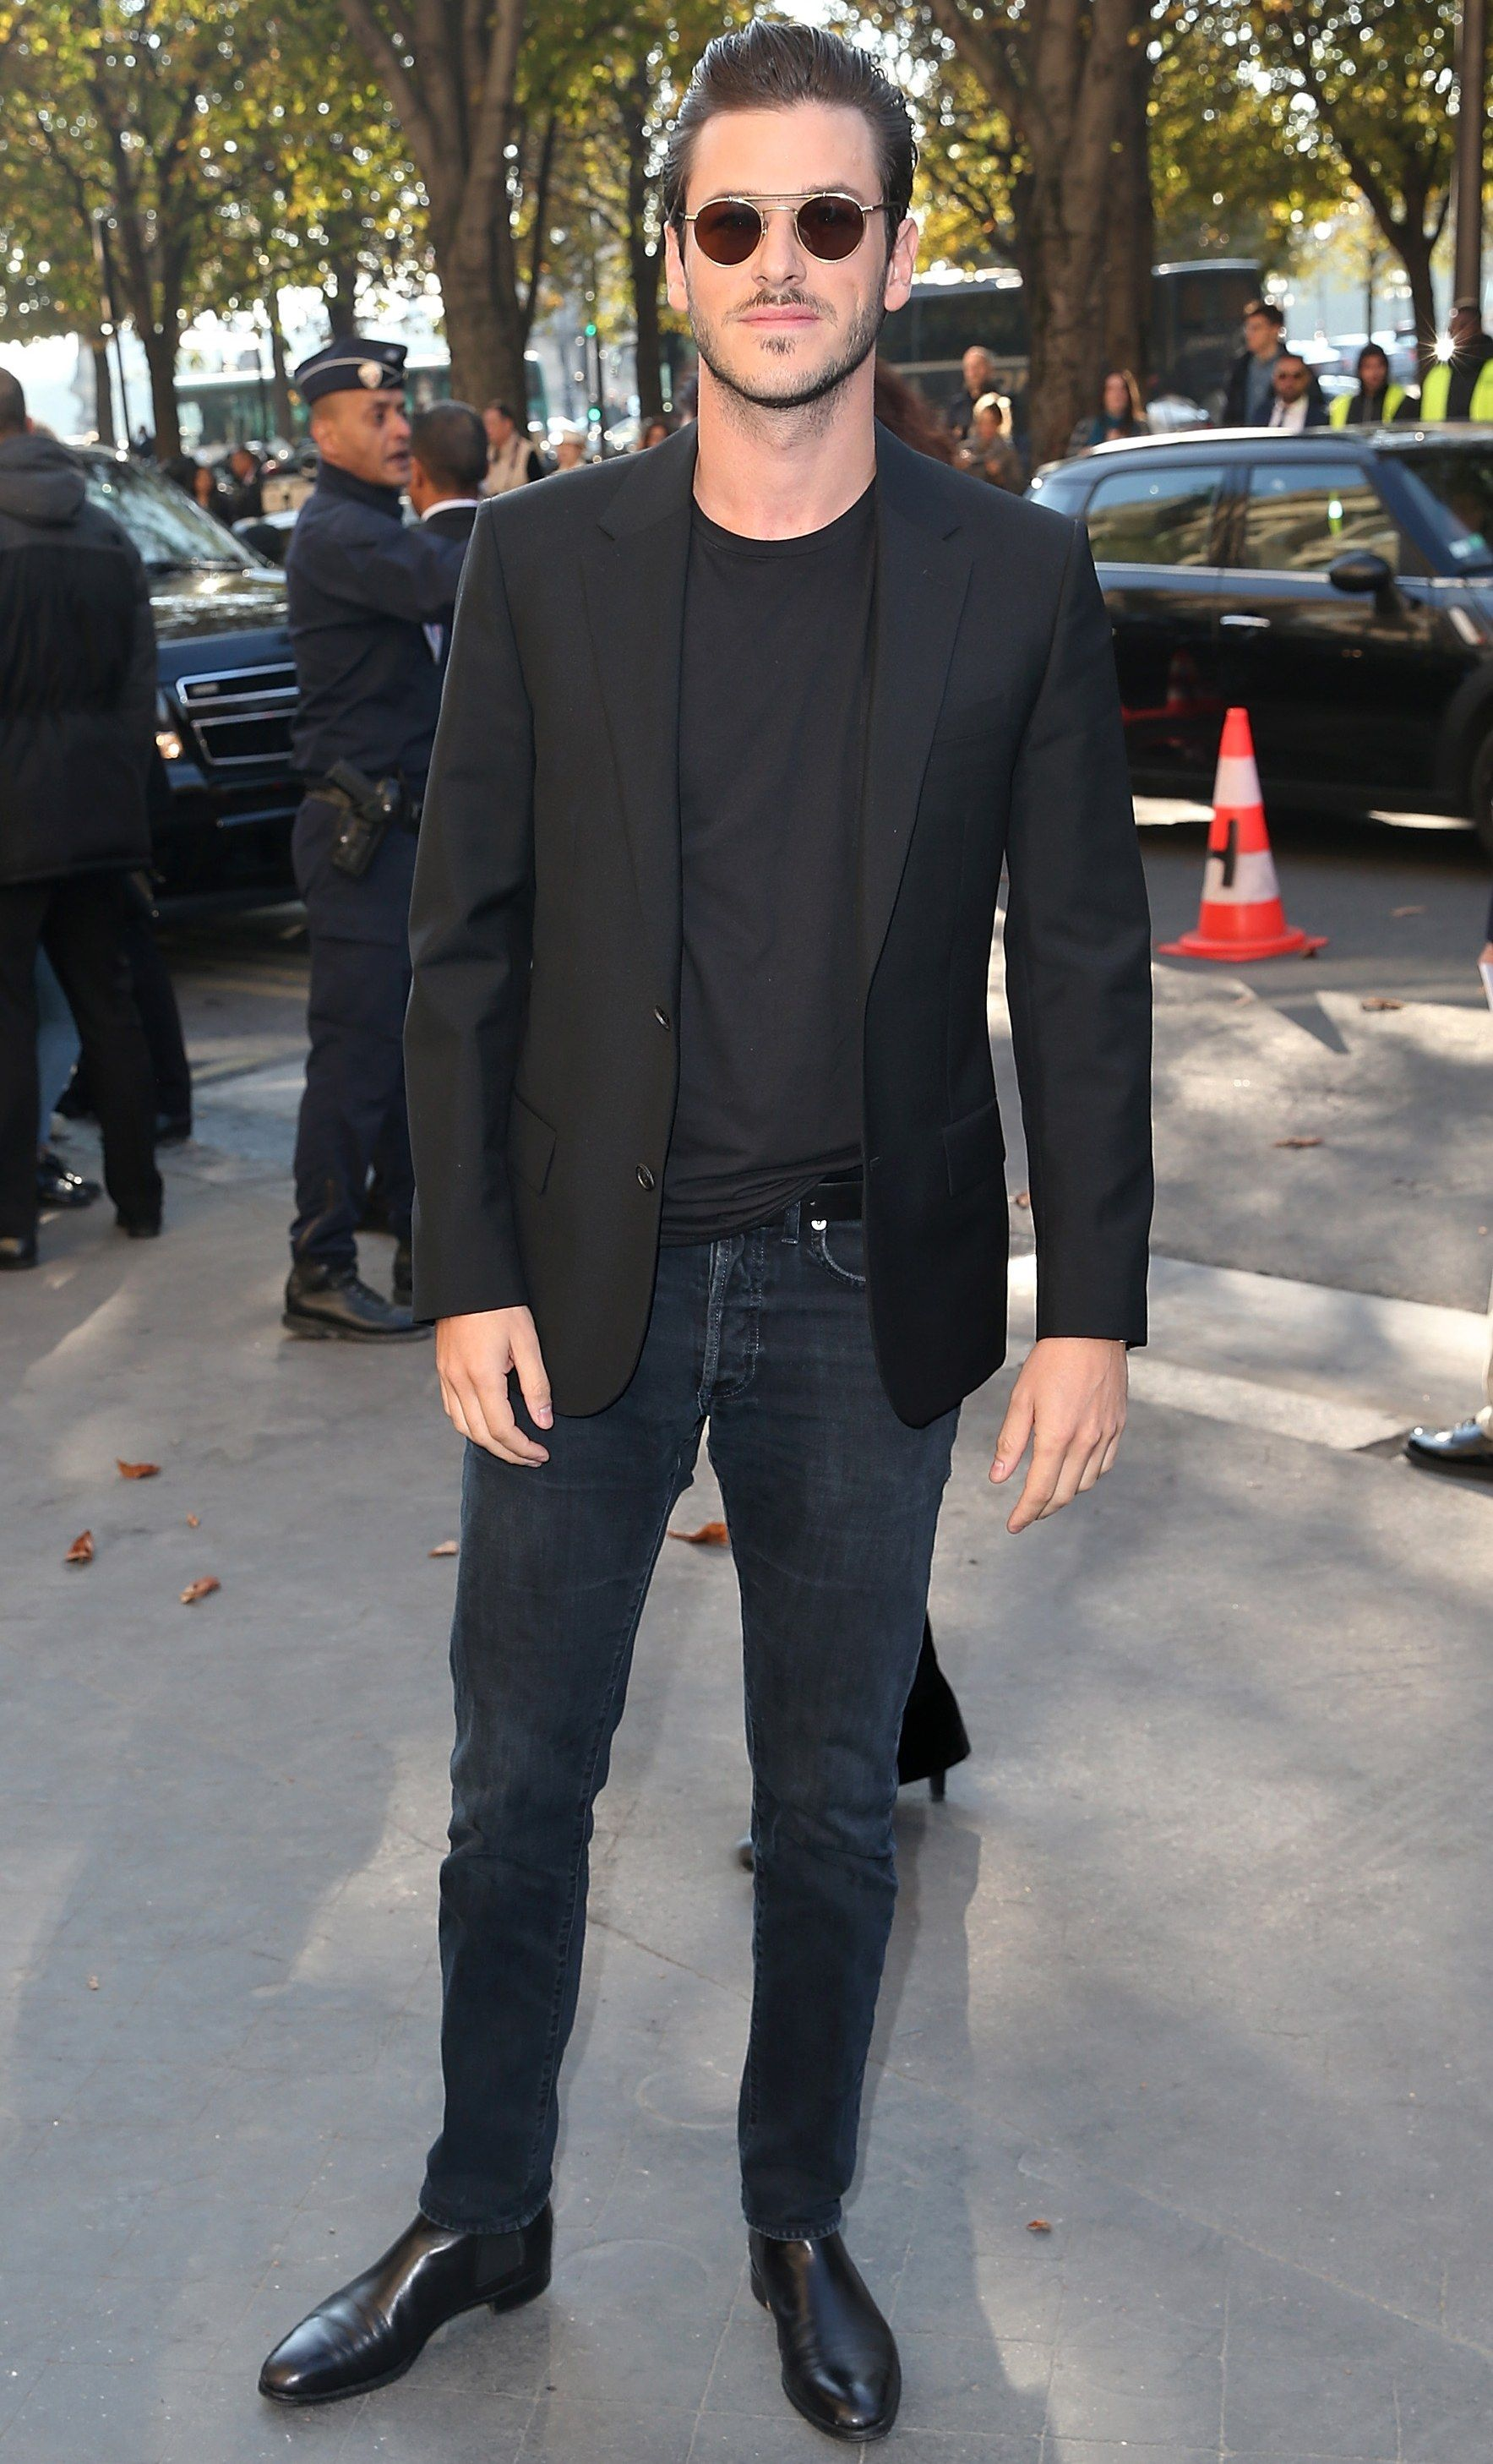 guantitate limitată cumpărare ieftin preturi ieftine The 10 Best Dressed Men of the Week 10.8.16   Black jeans men ...